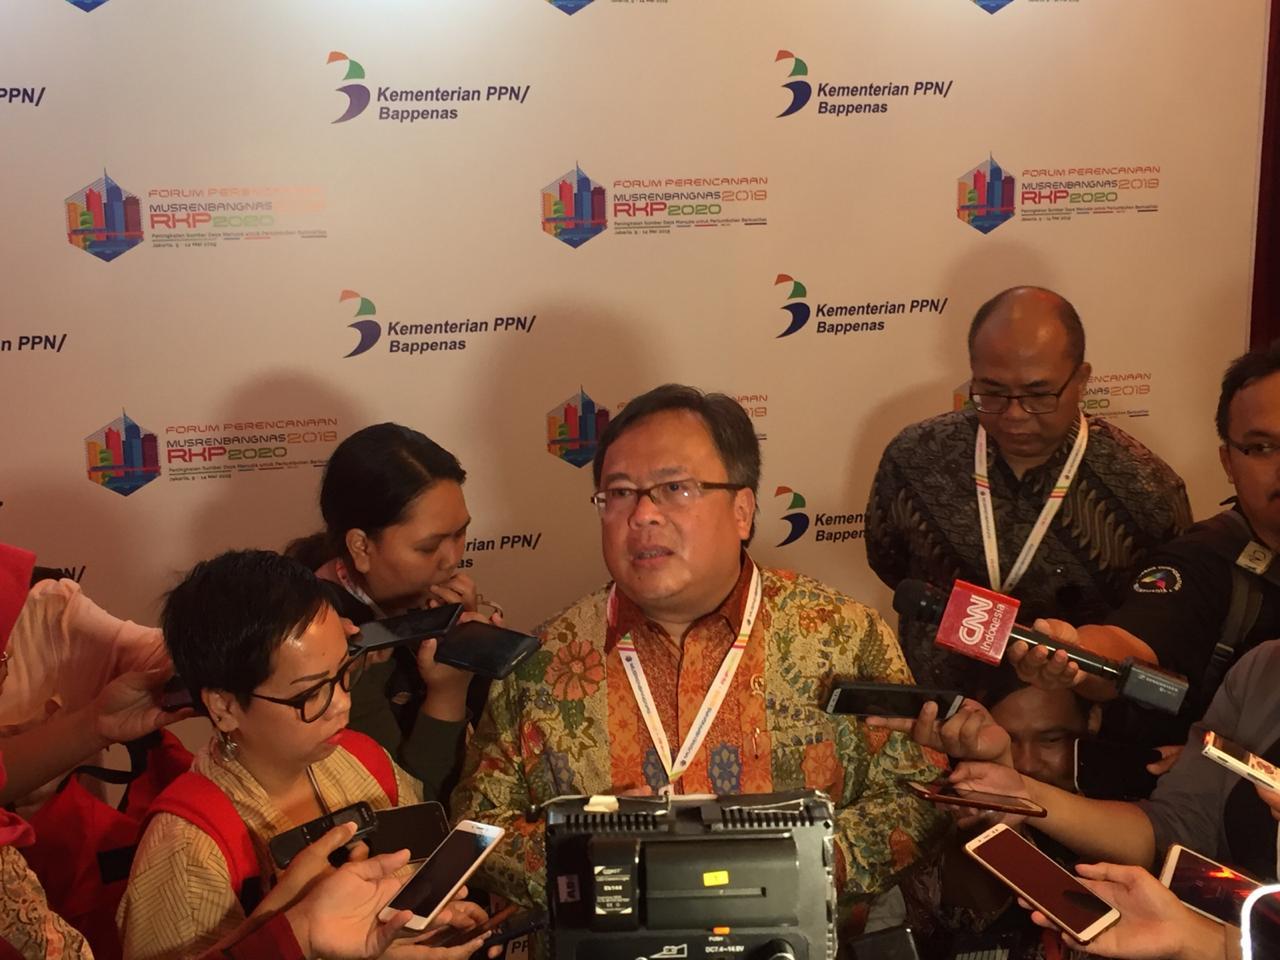 https: img-k.okeinfo.net content 2019 05 09 20 2053485 4-syarat-agar-ekonomi-indonesia-terbesar-nomor-5-di-dunia-m6RboFNhrT.jpeg